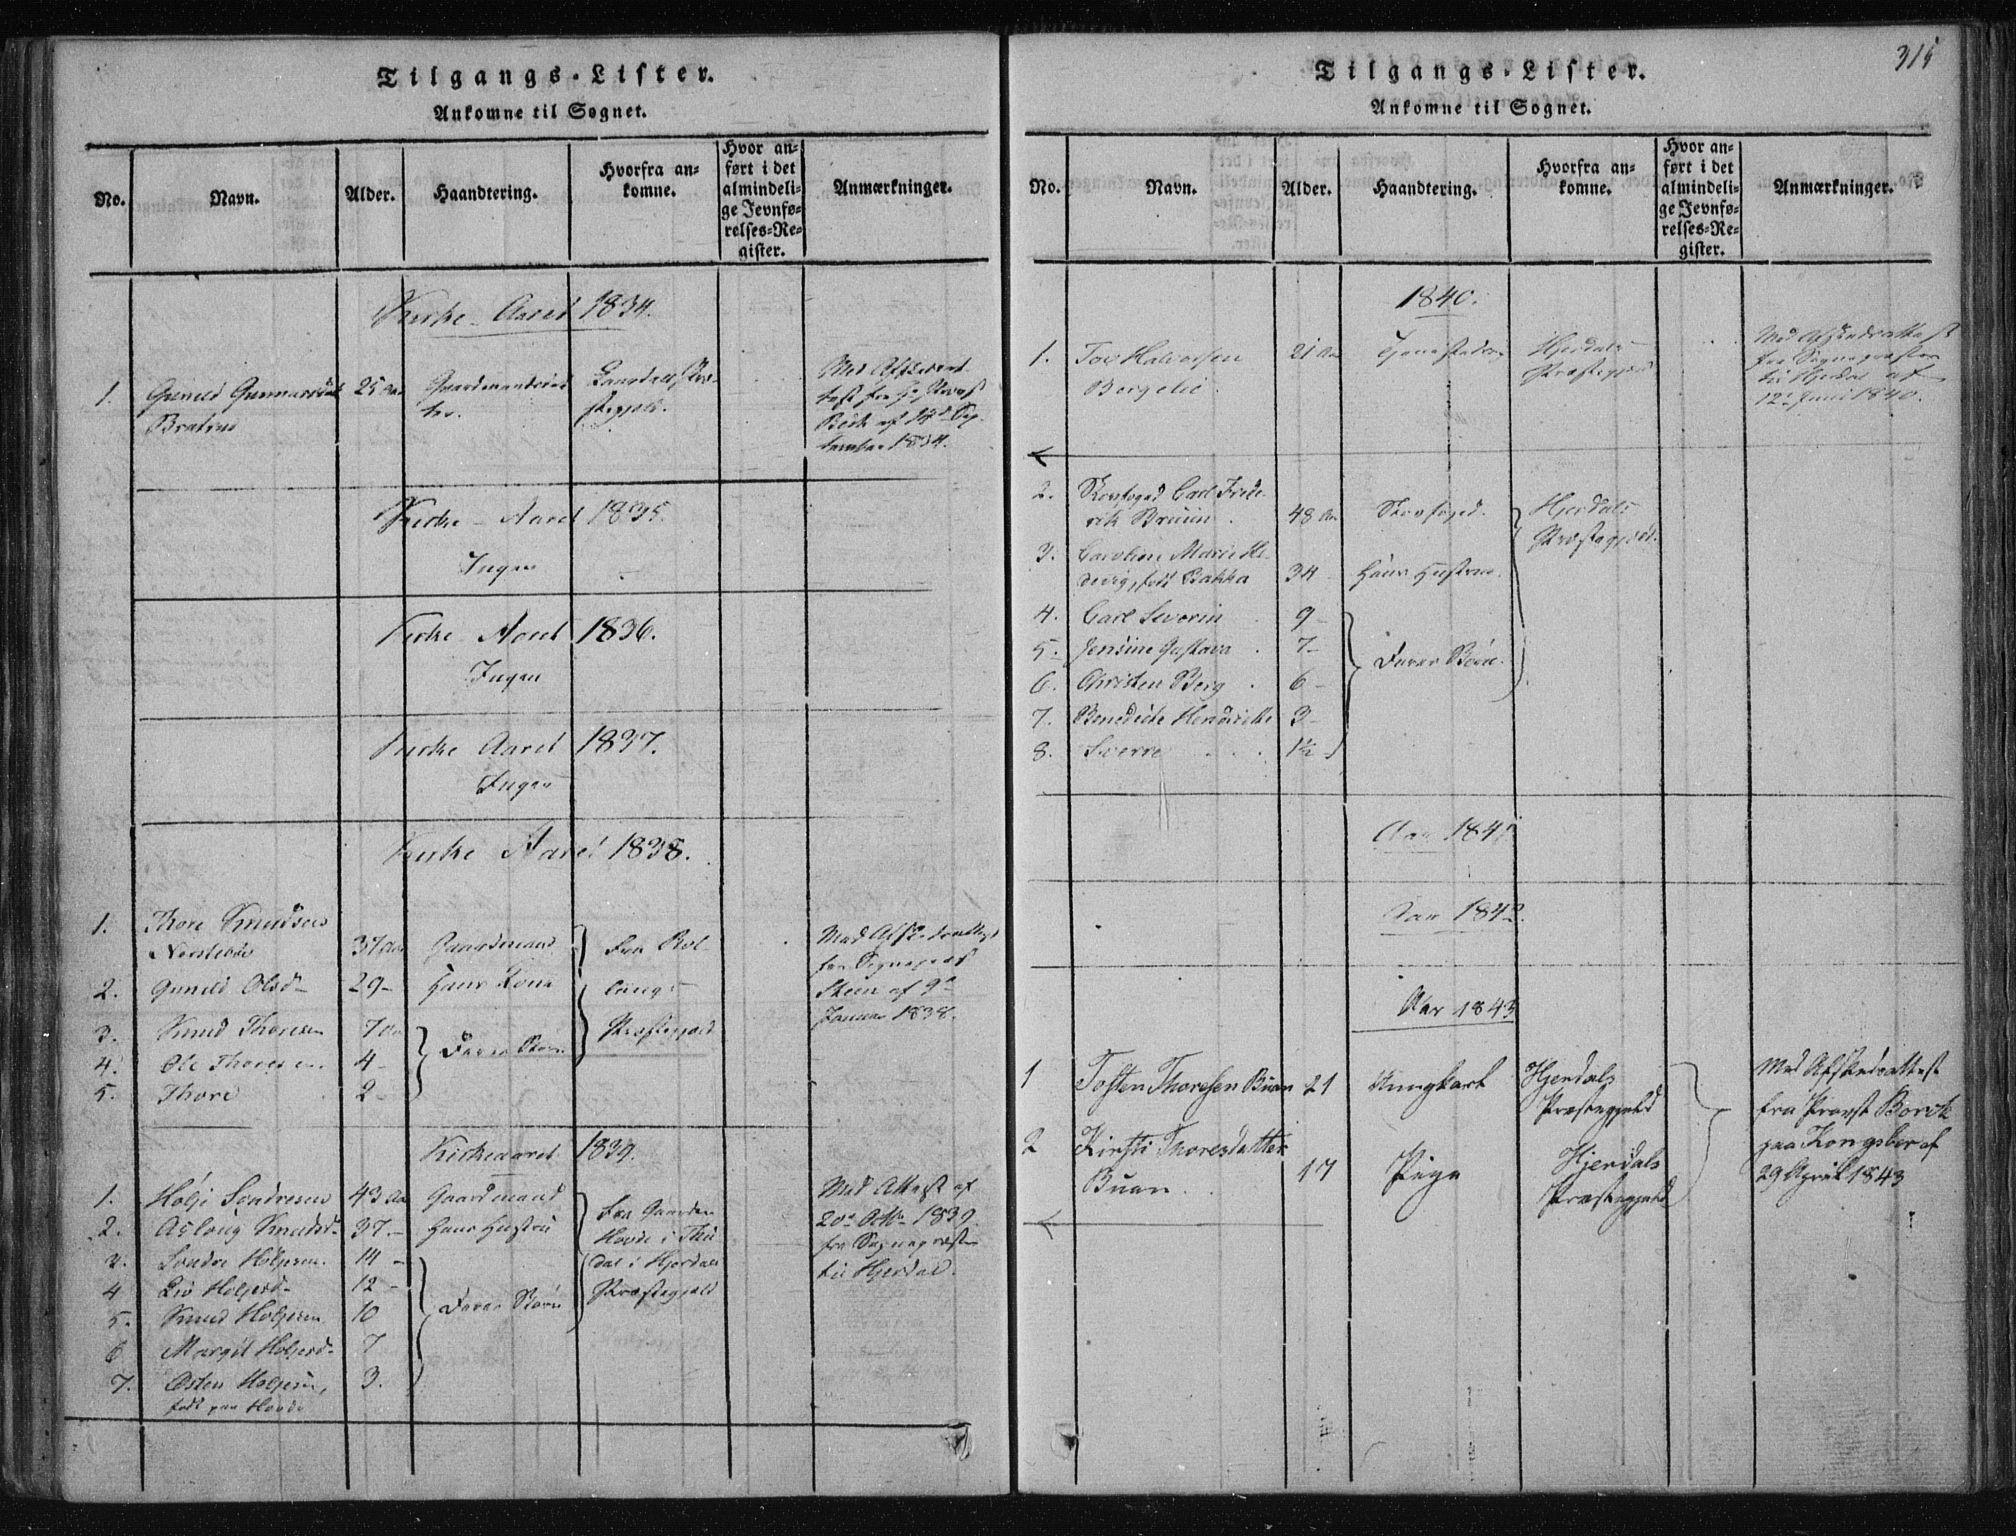 SAKO, Tinn kirkebøker, F/Fa/L0004: Ministerialbok nr. I 4, 1815-1843, s. 315